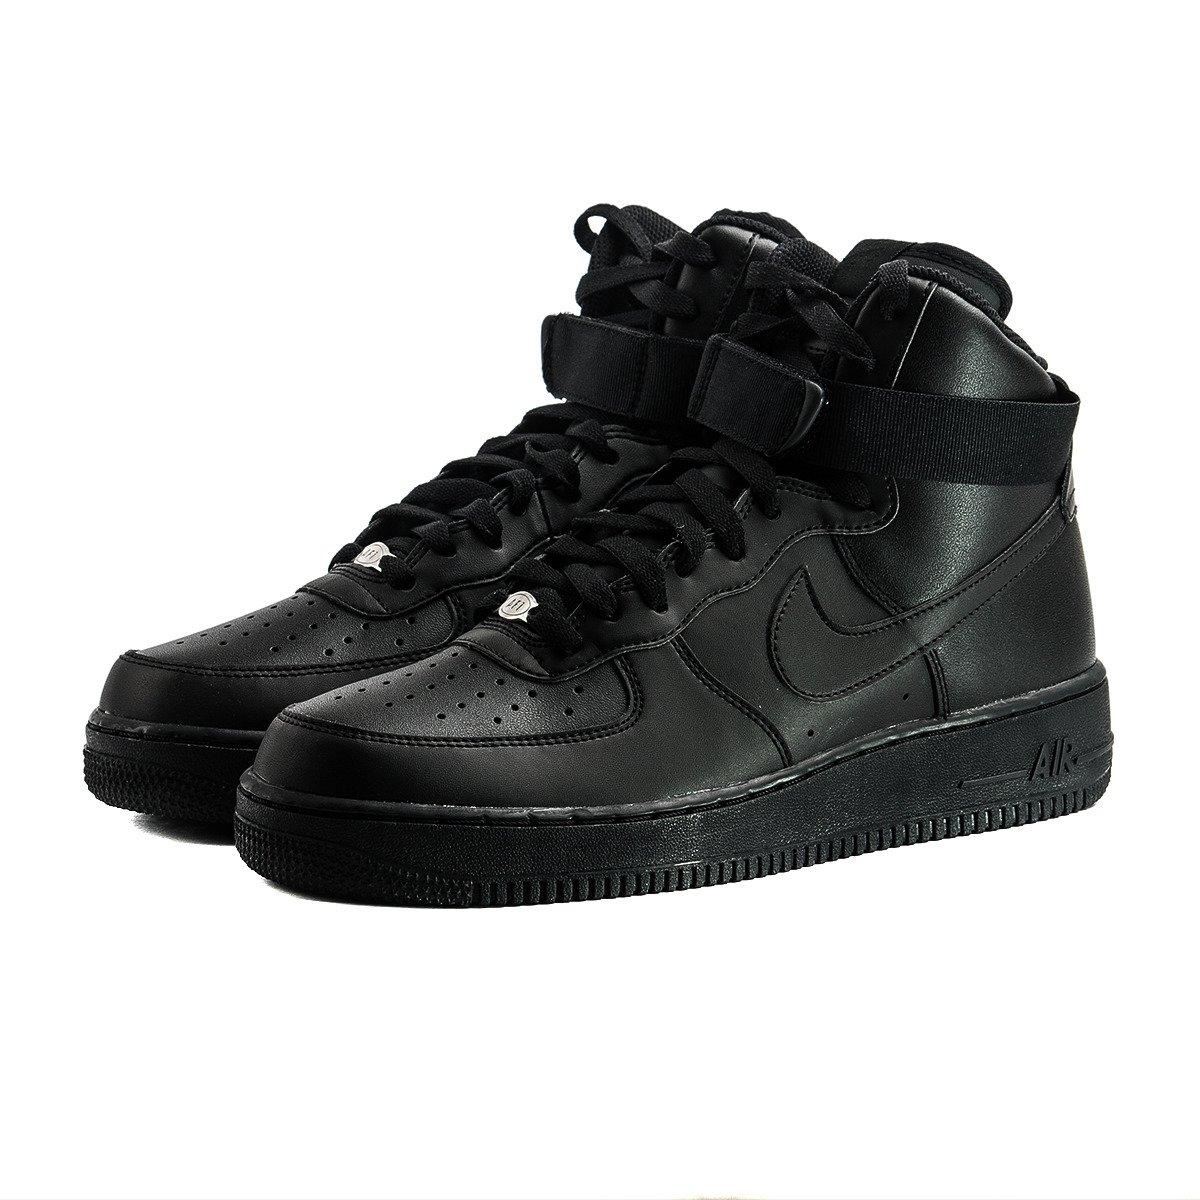 Nike Air Force 1 High '07 - 315121 032